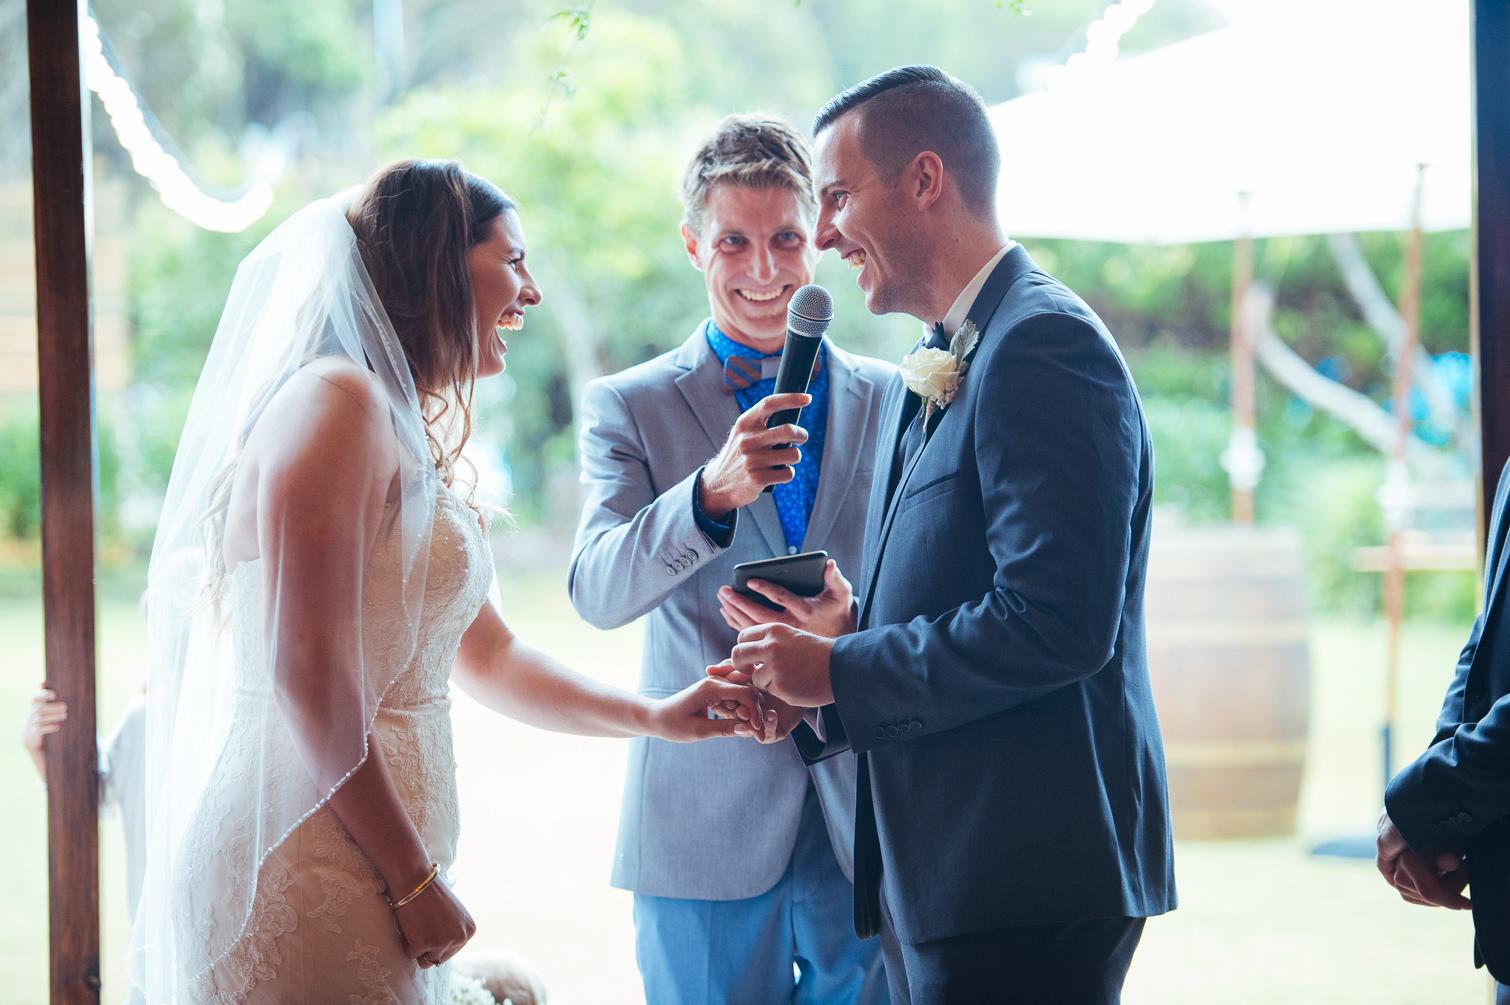 Kingscliffe_male_wedding_celebrant-Benjamin_Carlyle -18.jpg